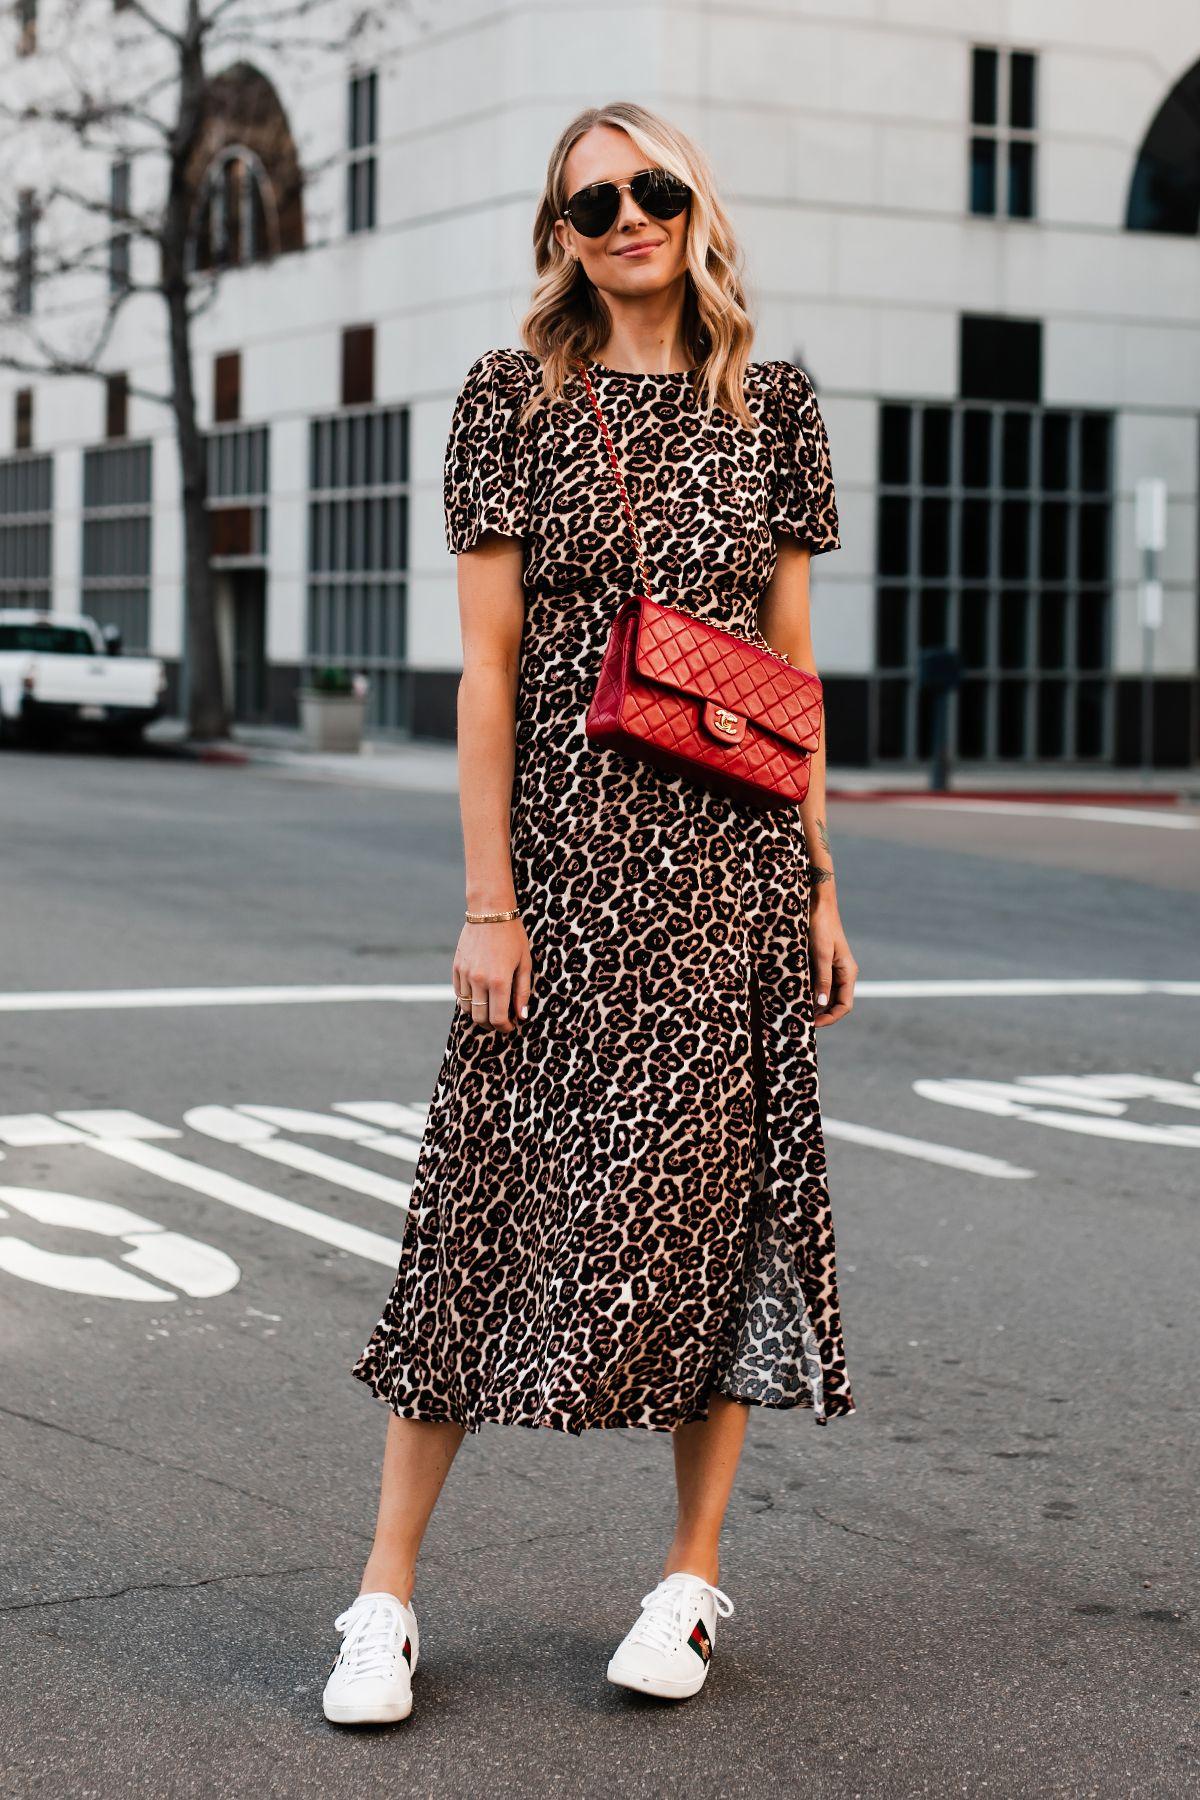 7 Model Dress Rumahan yang Jadi Trend Fashion #DiRumahAja